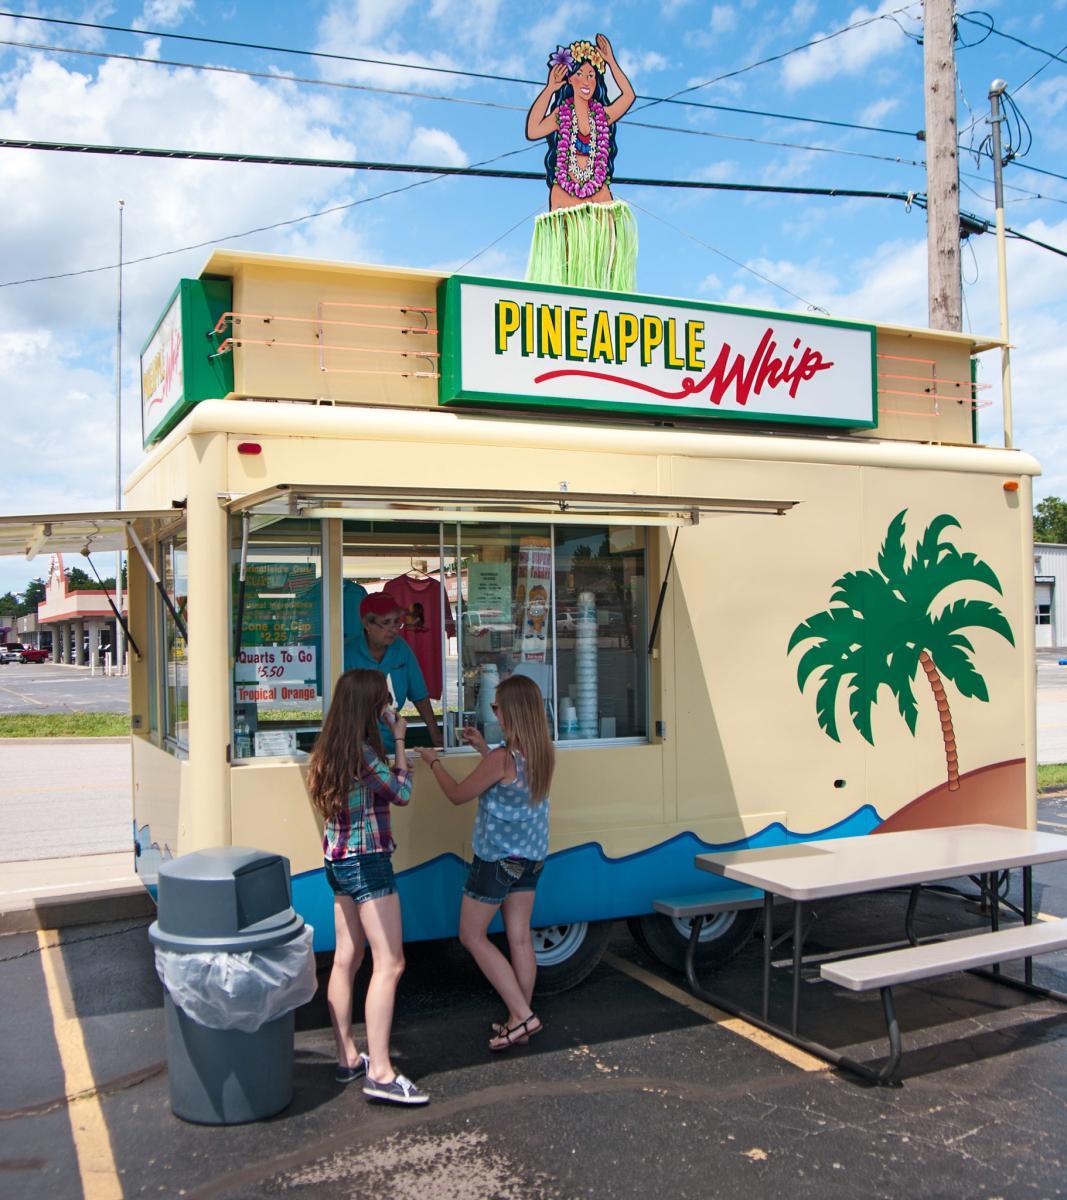 Girls getting Pineapple Whip